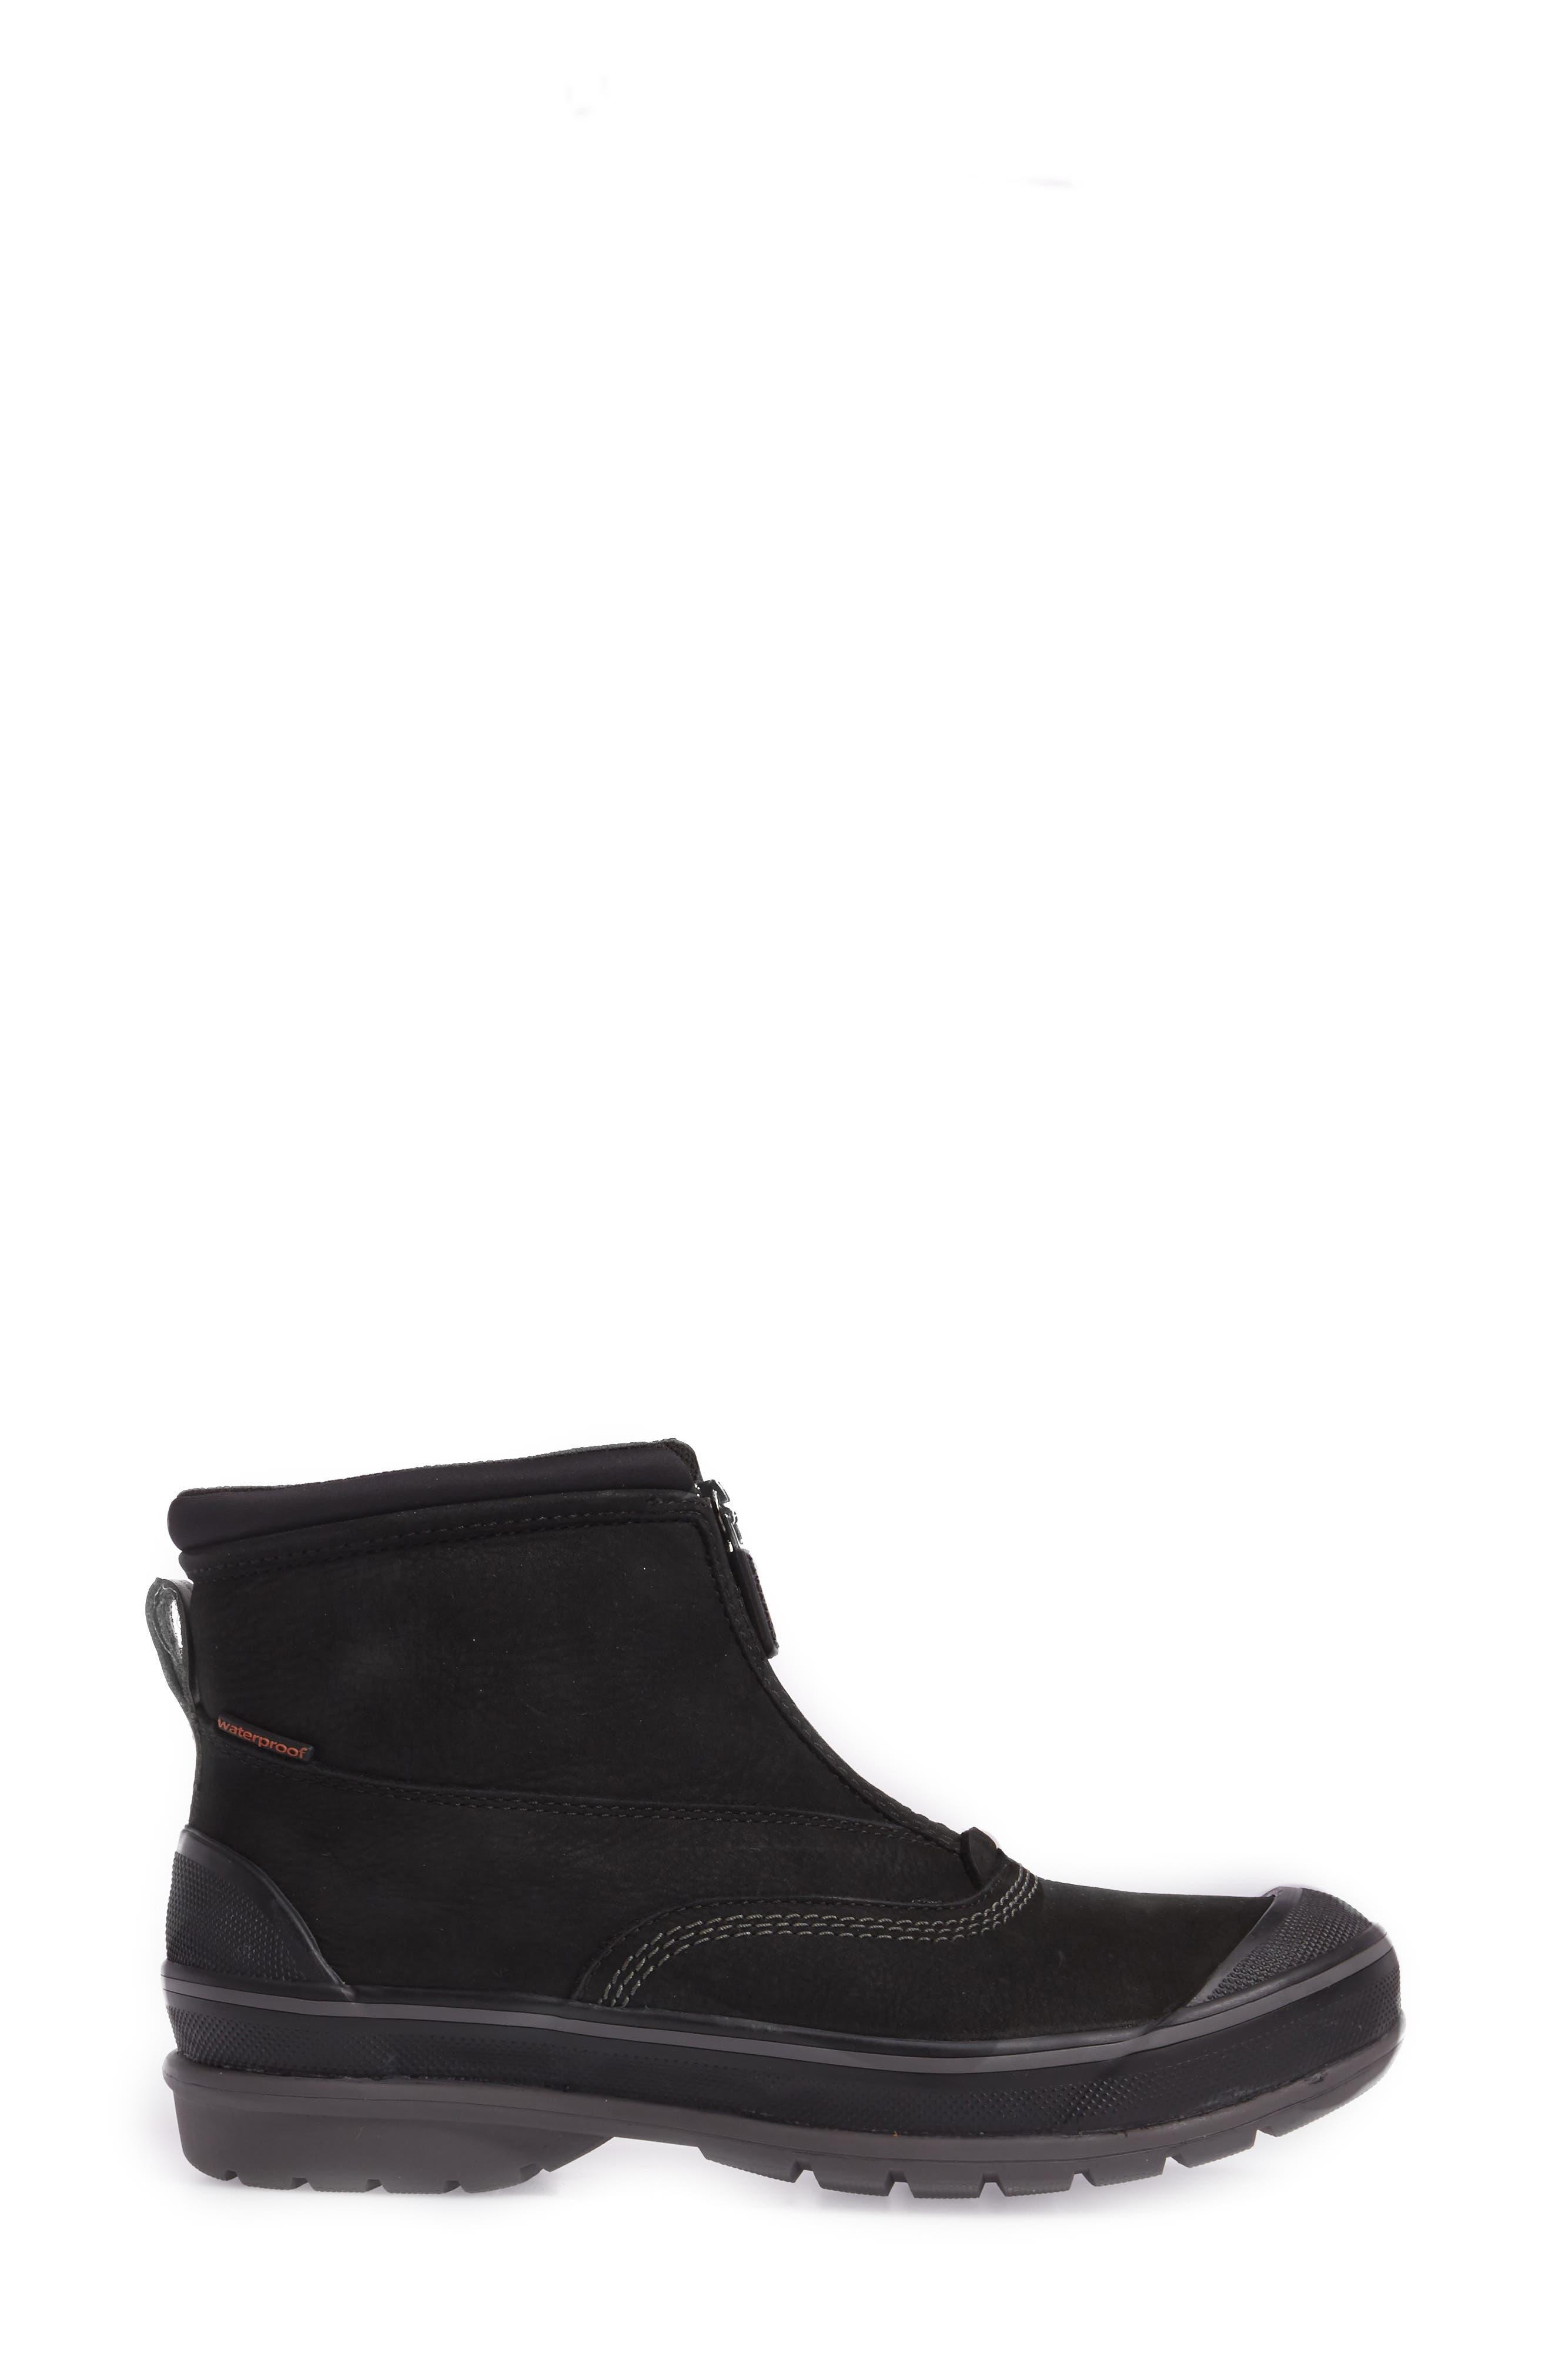 Alternate Image 3  - Clarks® Muckers Hike Waterproof Boot (Women)